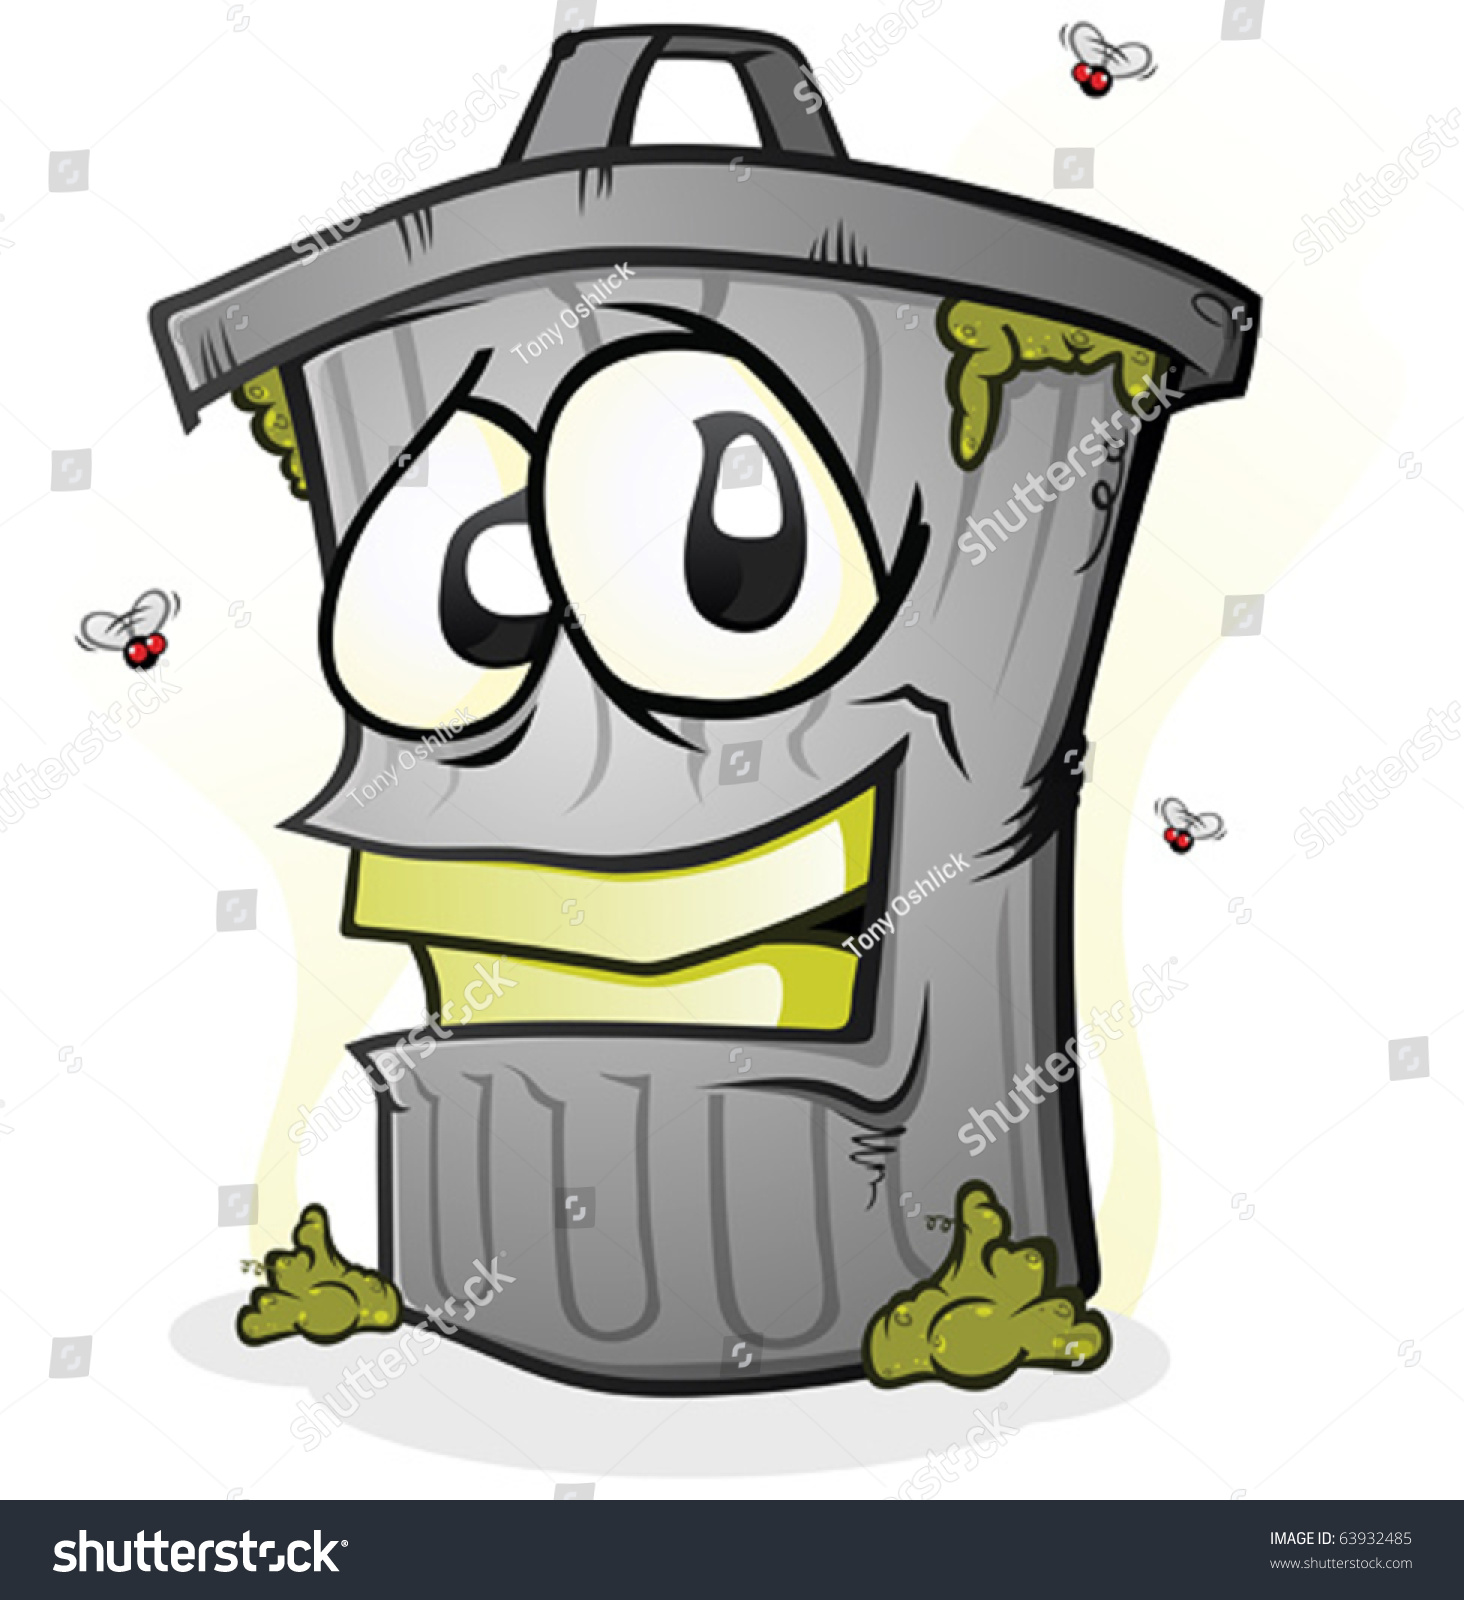 Smiling dirty trash can cartoon character stock vector illustration